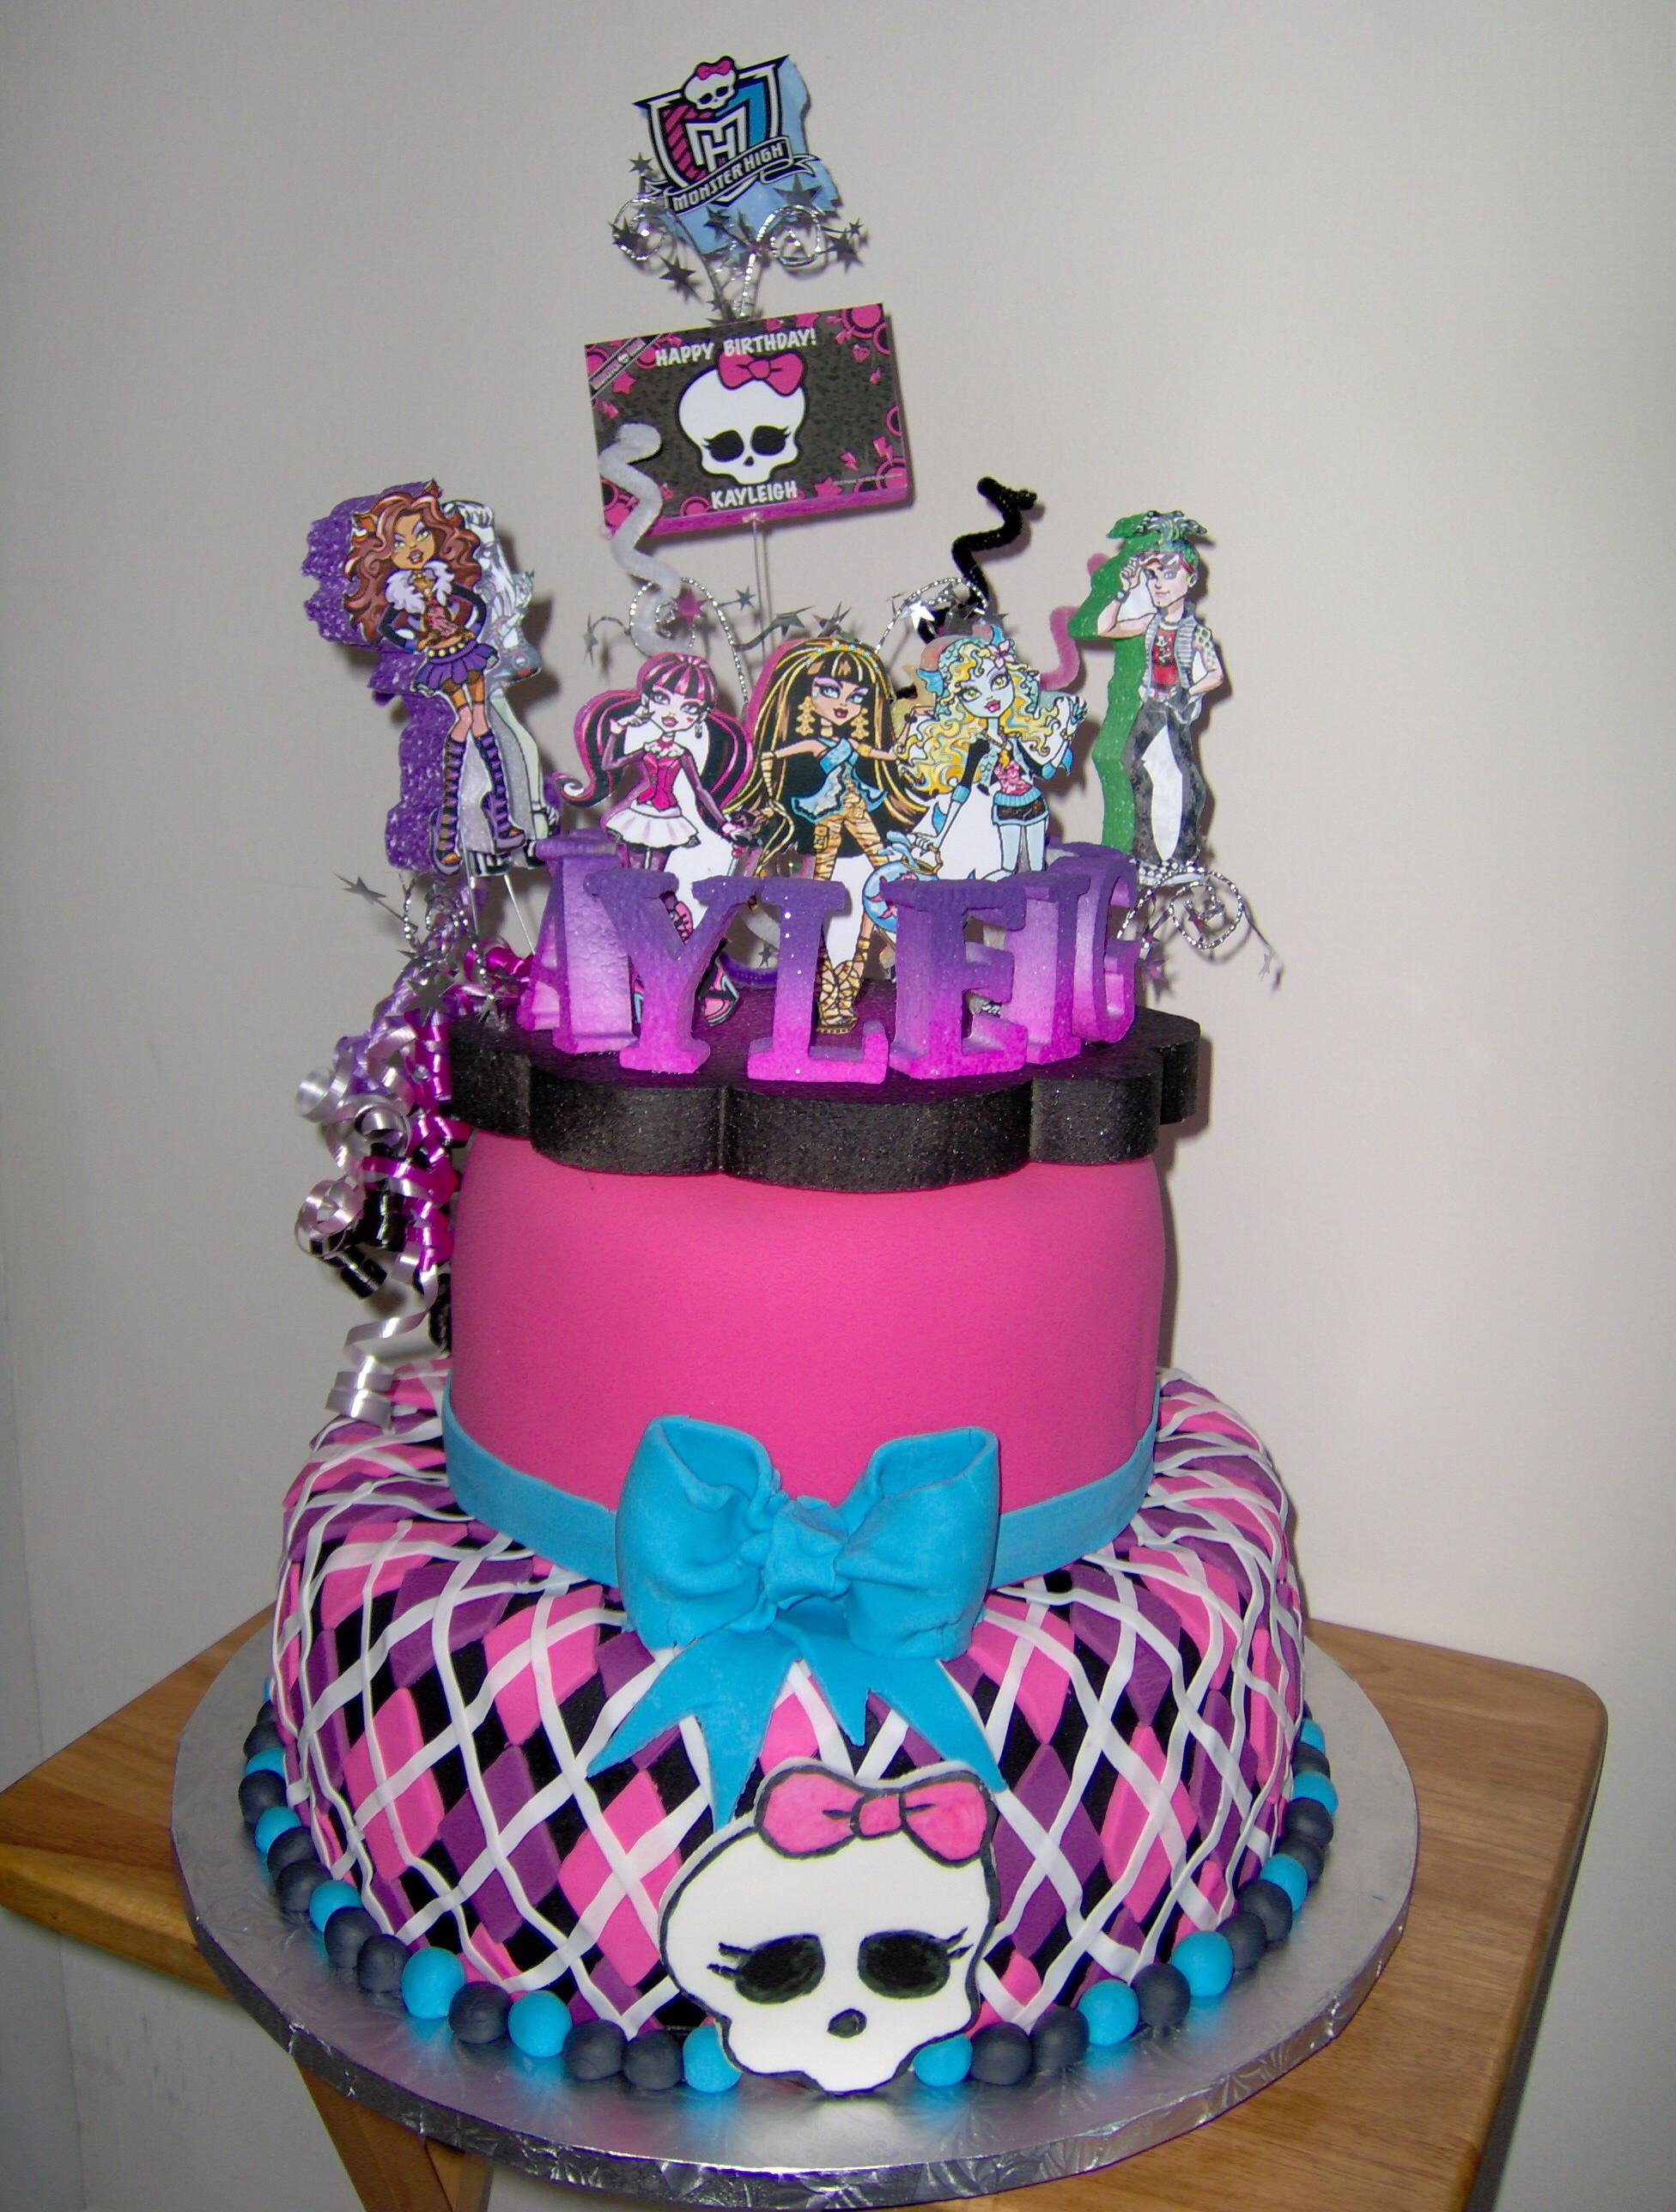 Birthday Cake Designs  25 Monster High Cake Ideas and Designs EchoMon